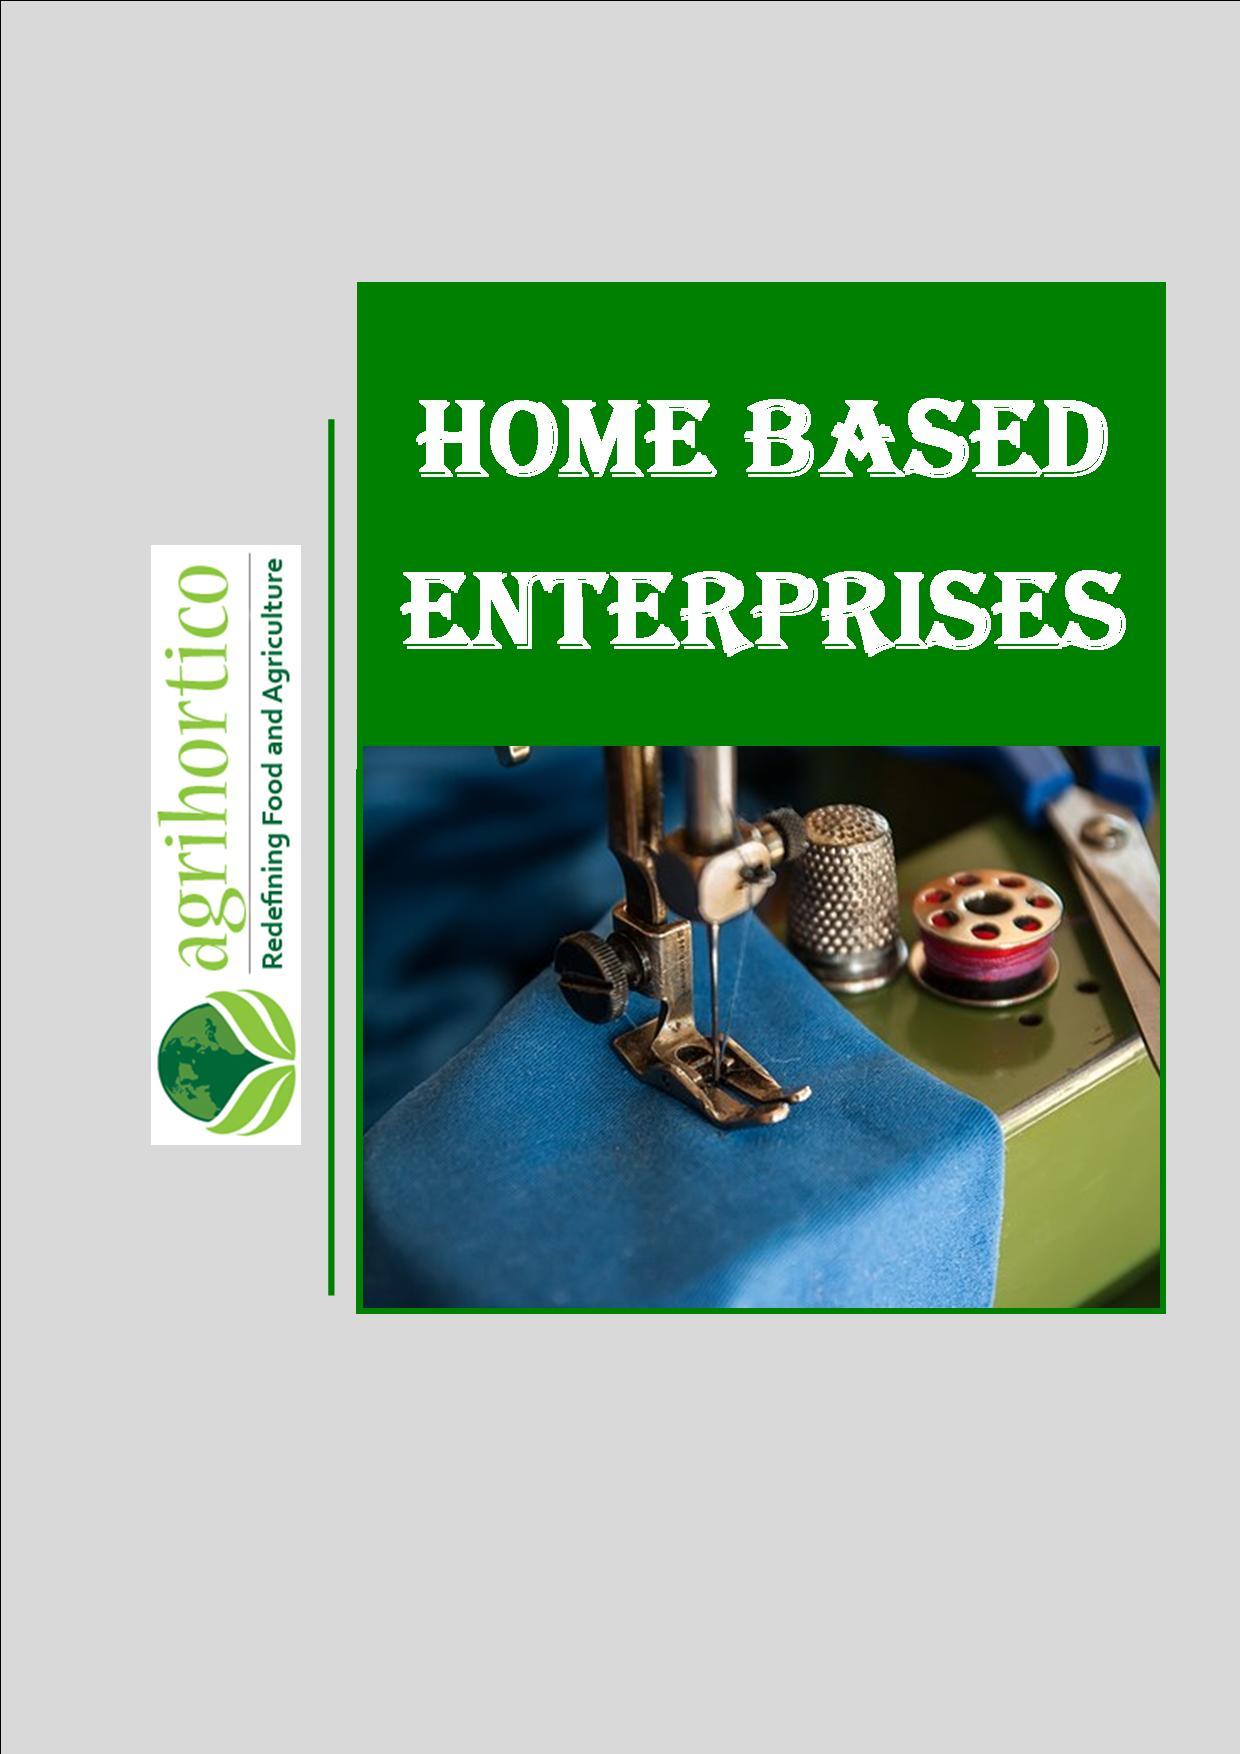 home-based-enterprises